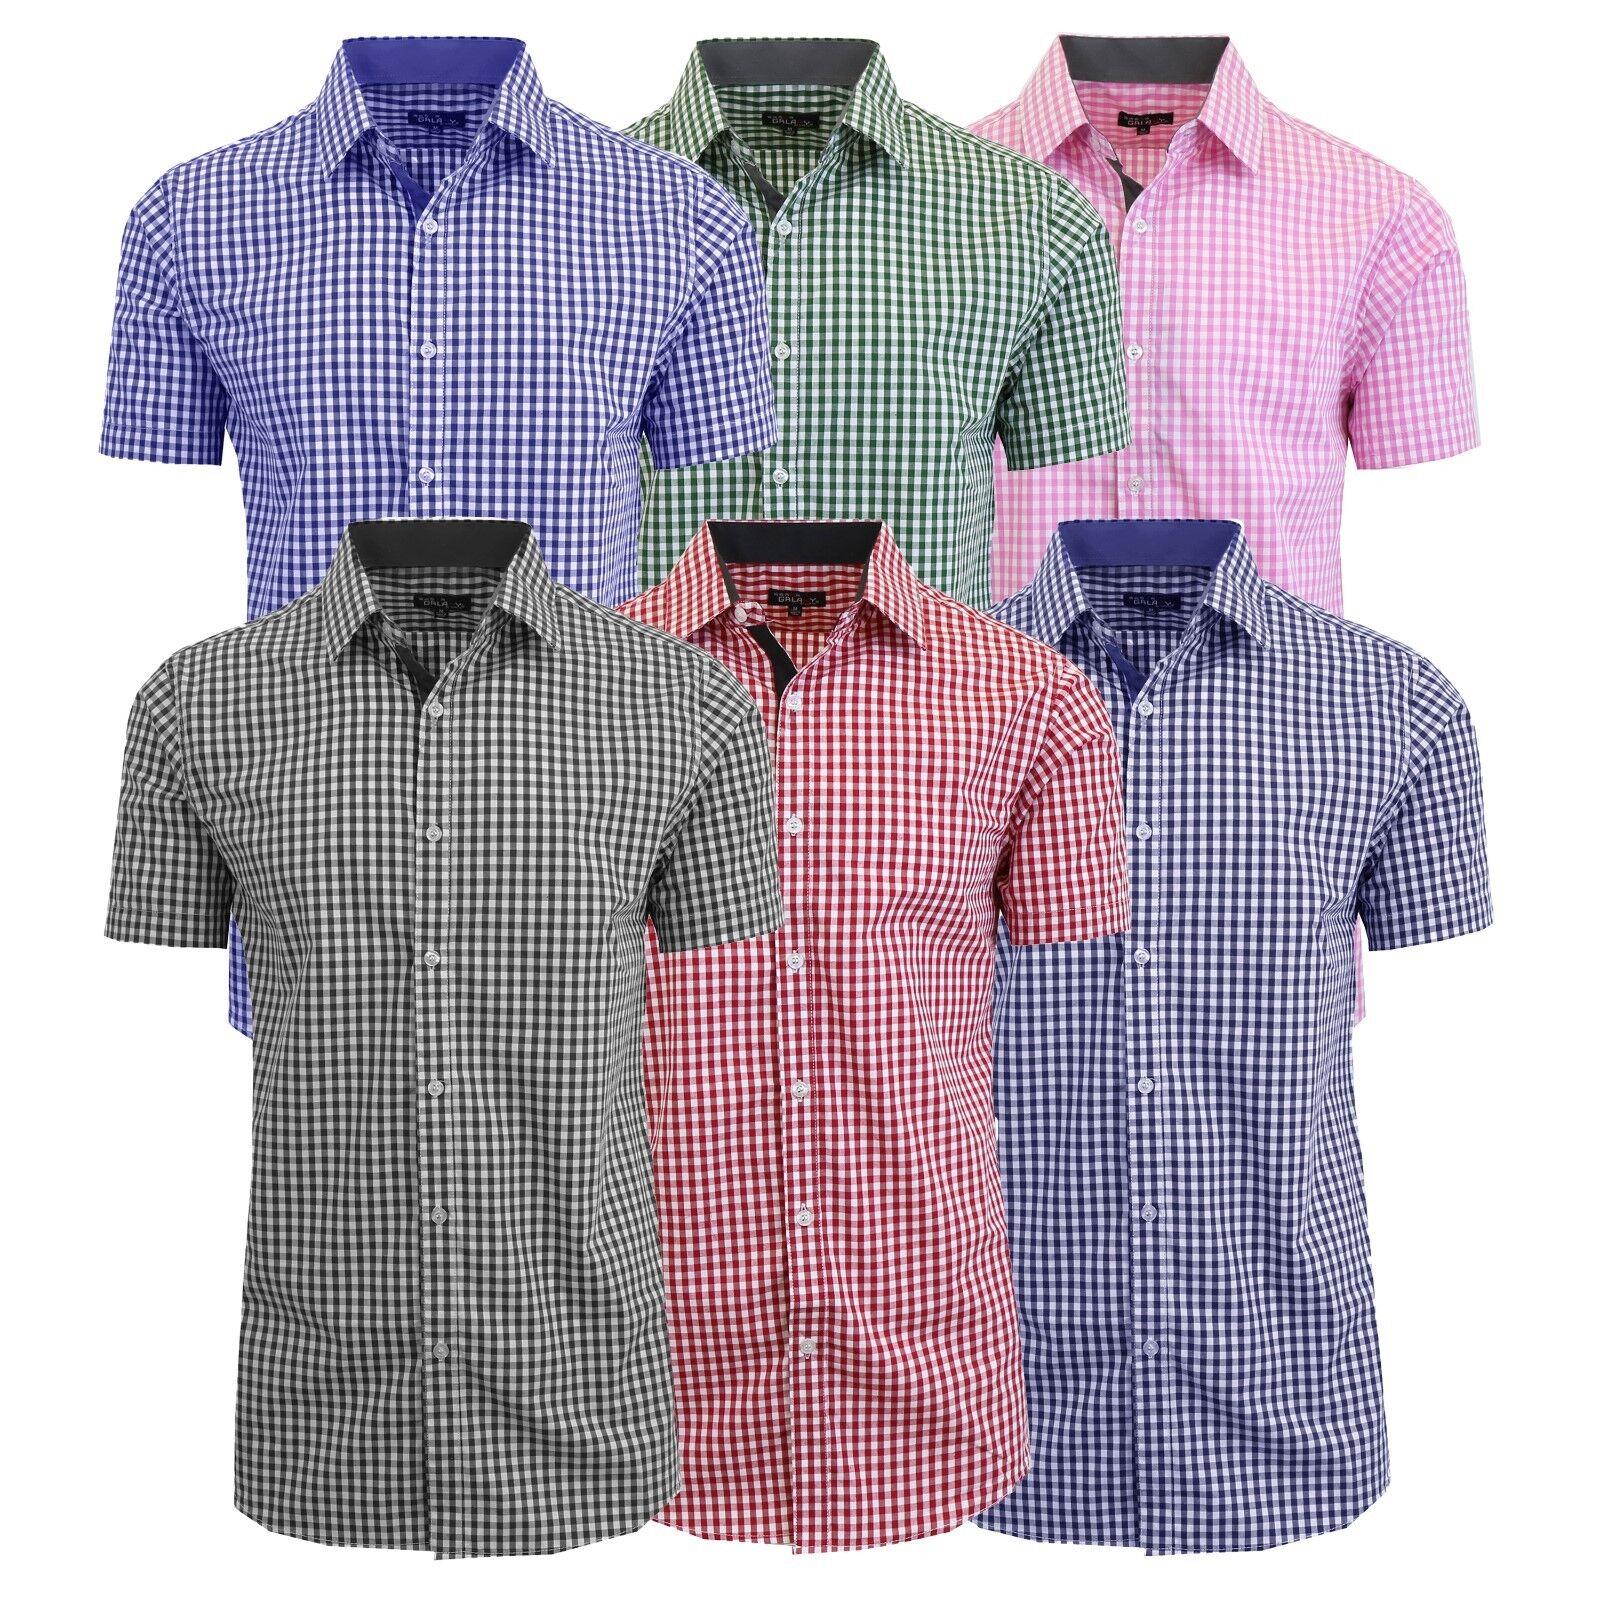 Mens Pink Gingham Short Sleeve Shirt Joe Maloy